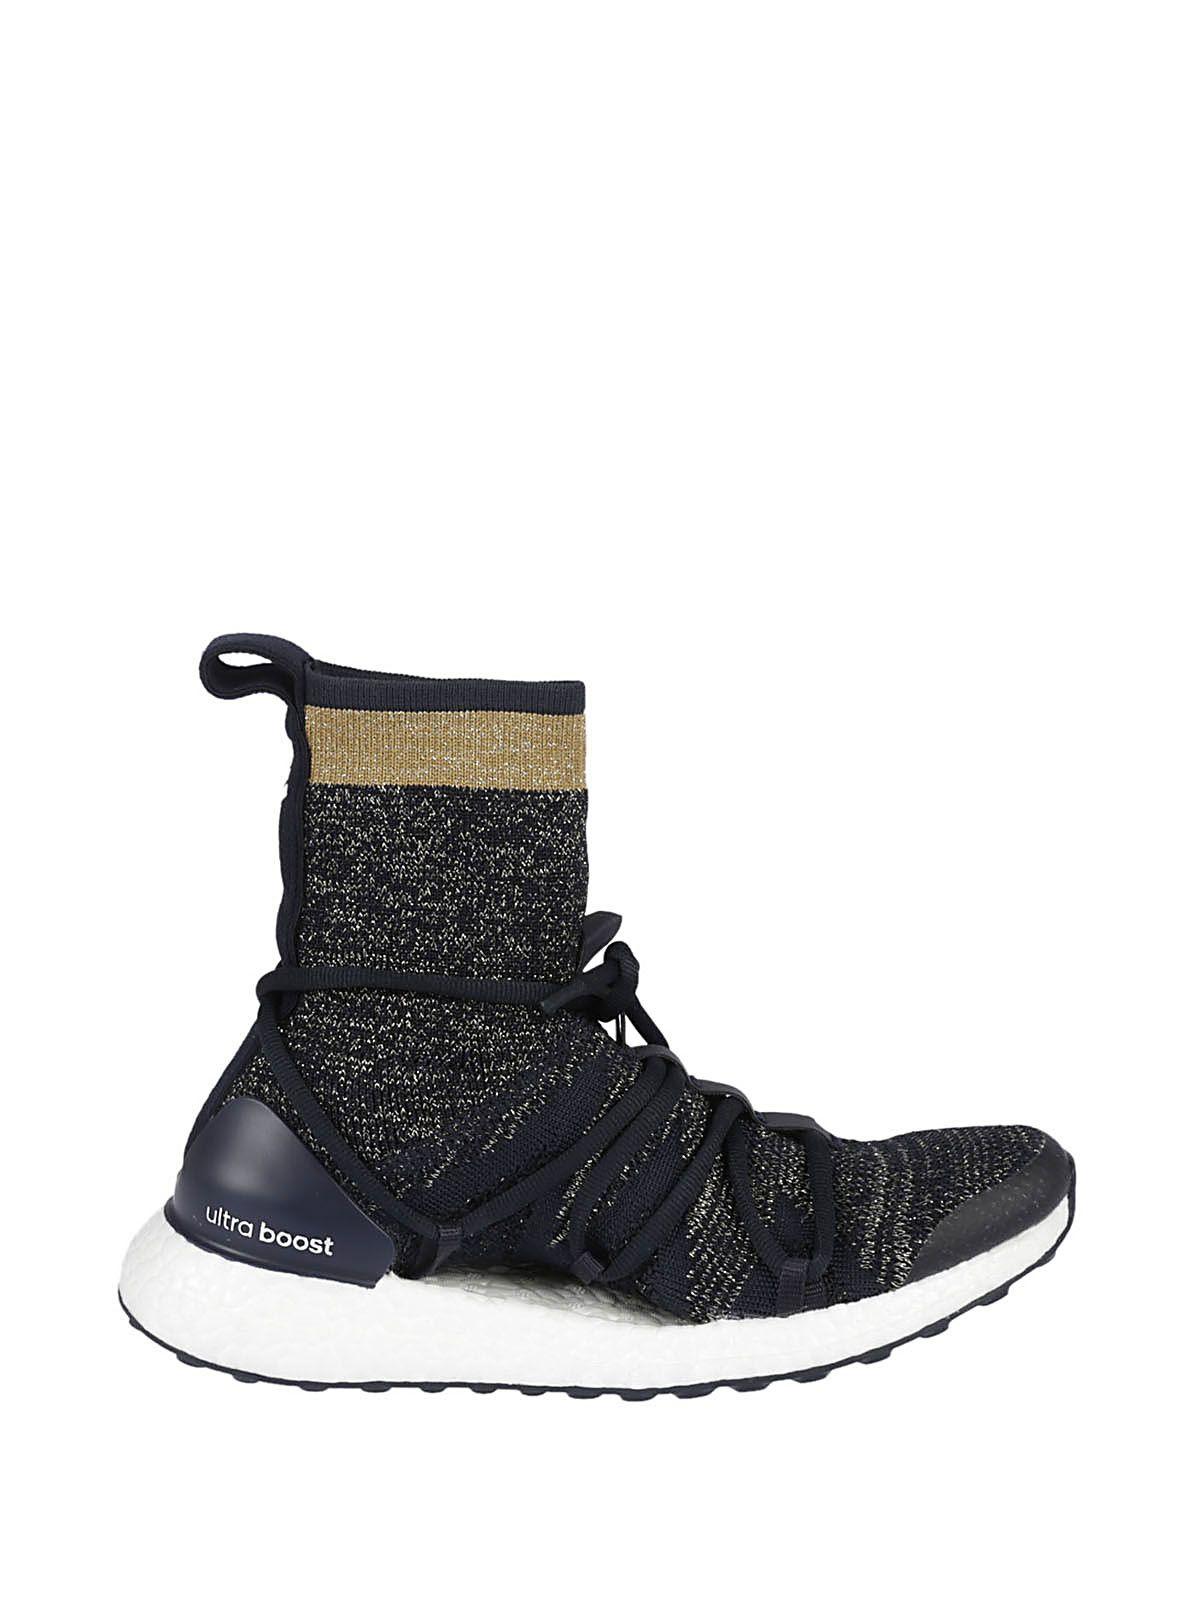 Adidas Ultra Boost X Mid Hi-top Sneakers